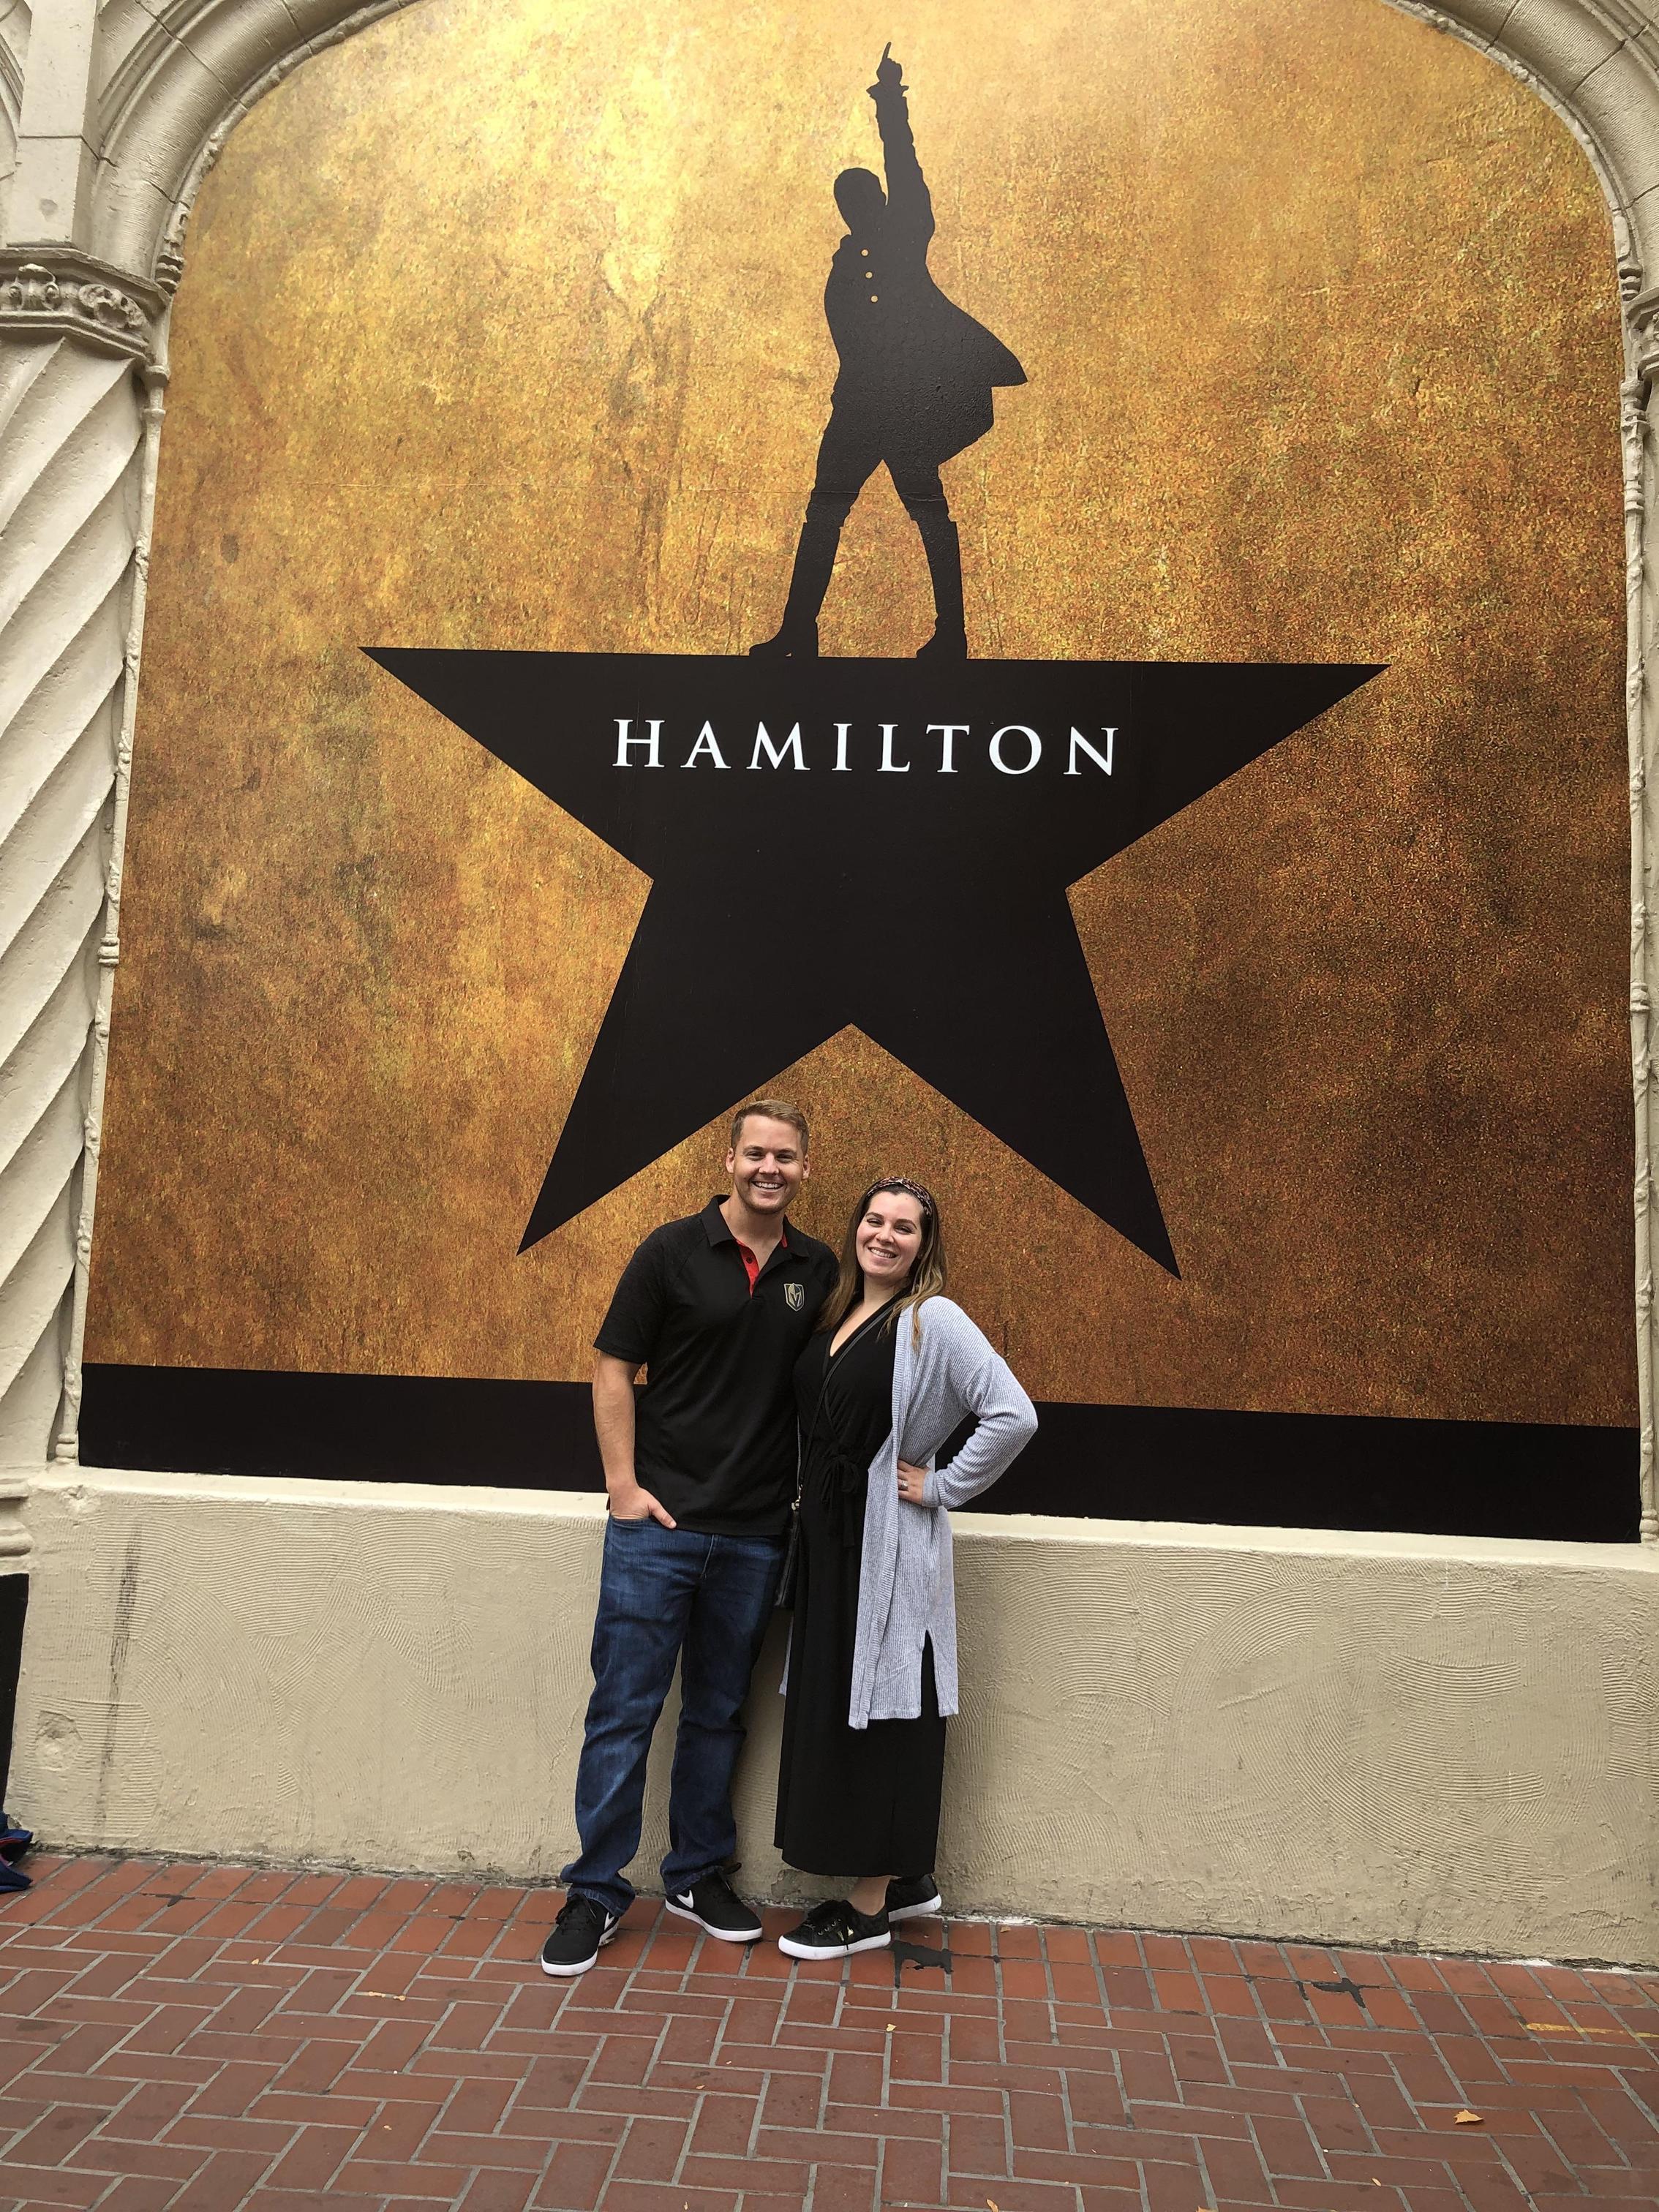 Hamilton!